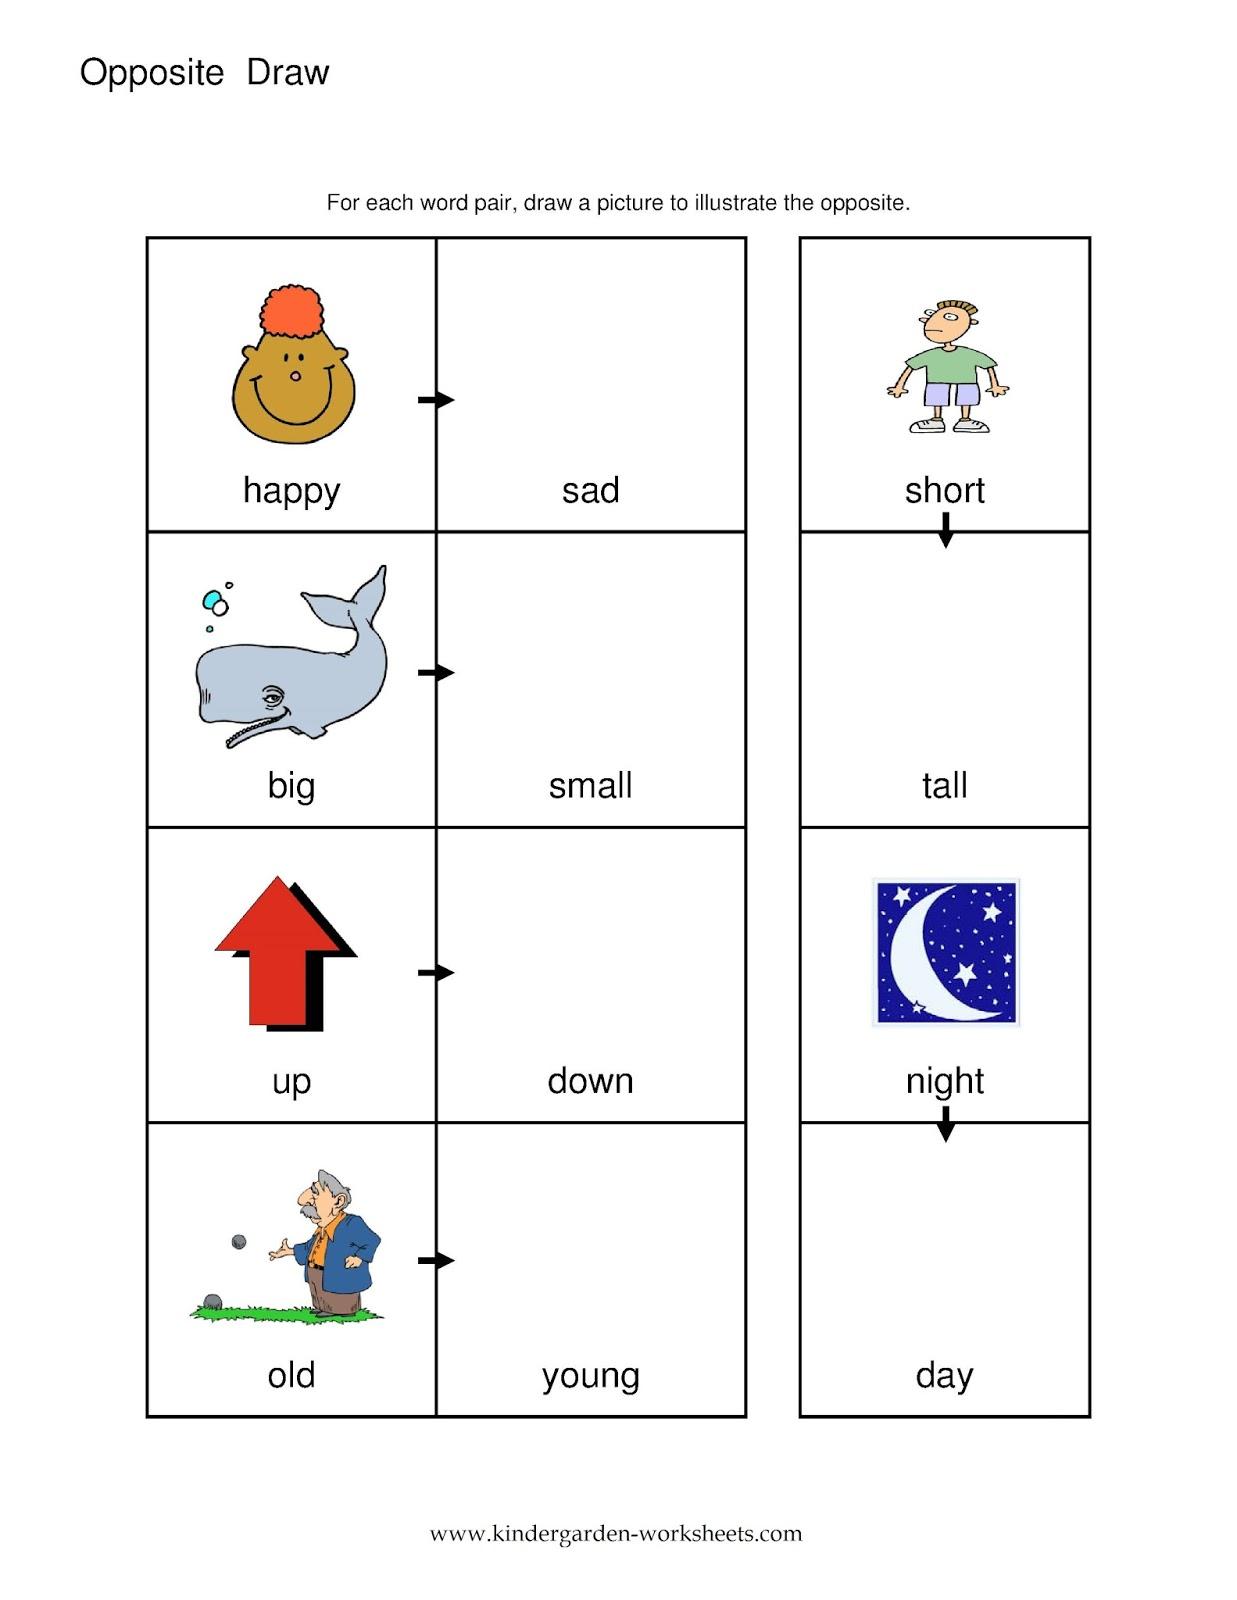 Kindergarten Worksheets On Opposites 611802